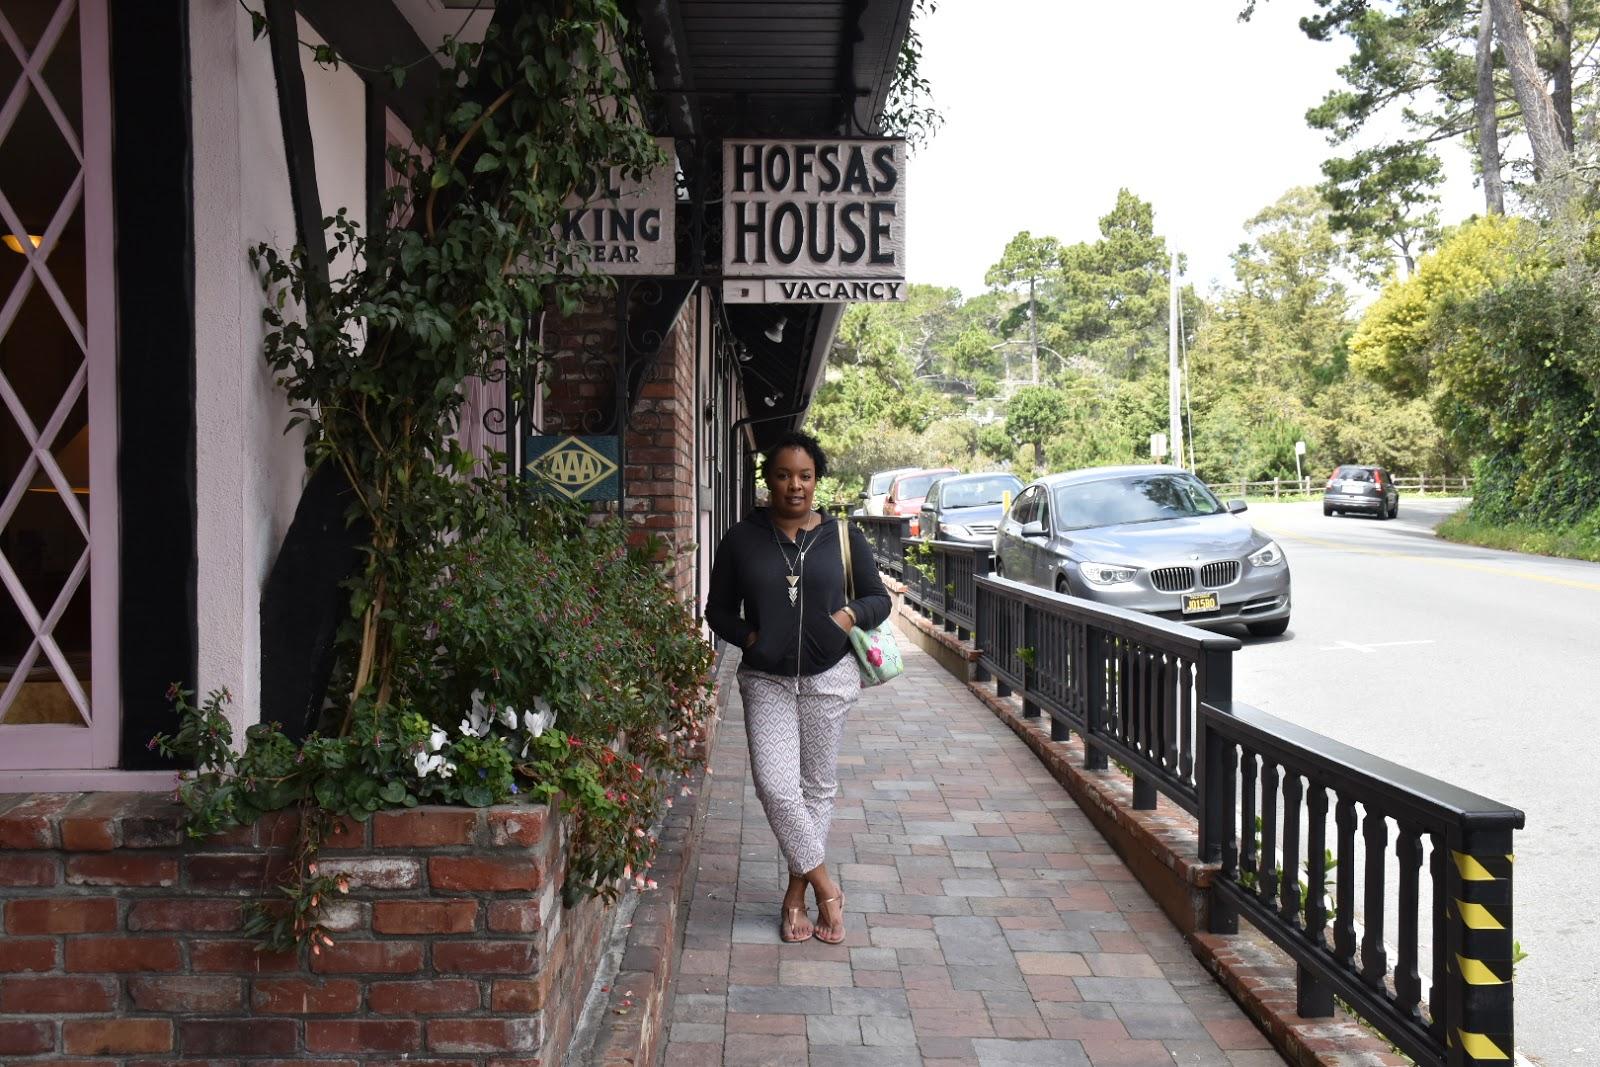 City Escape: Carmel-by-the-Sea at the Hofsas House  via  www.productreviewmom.com